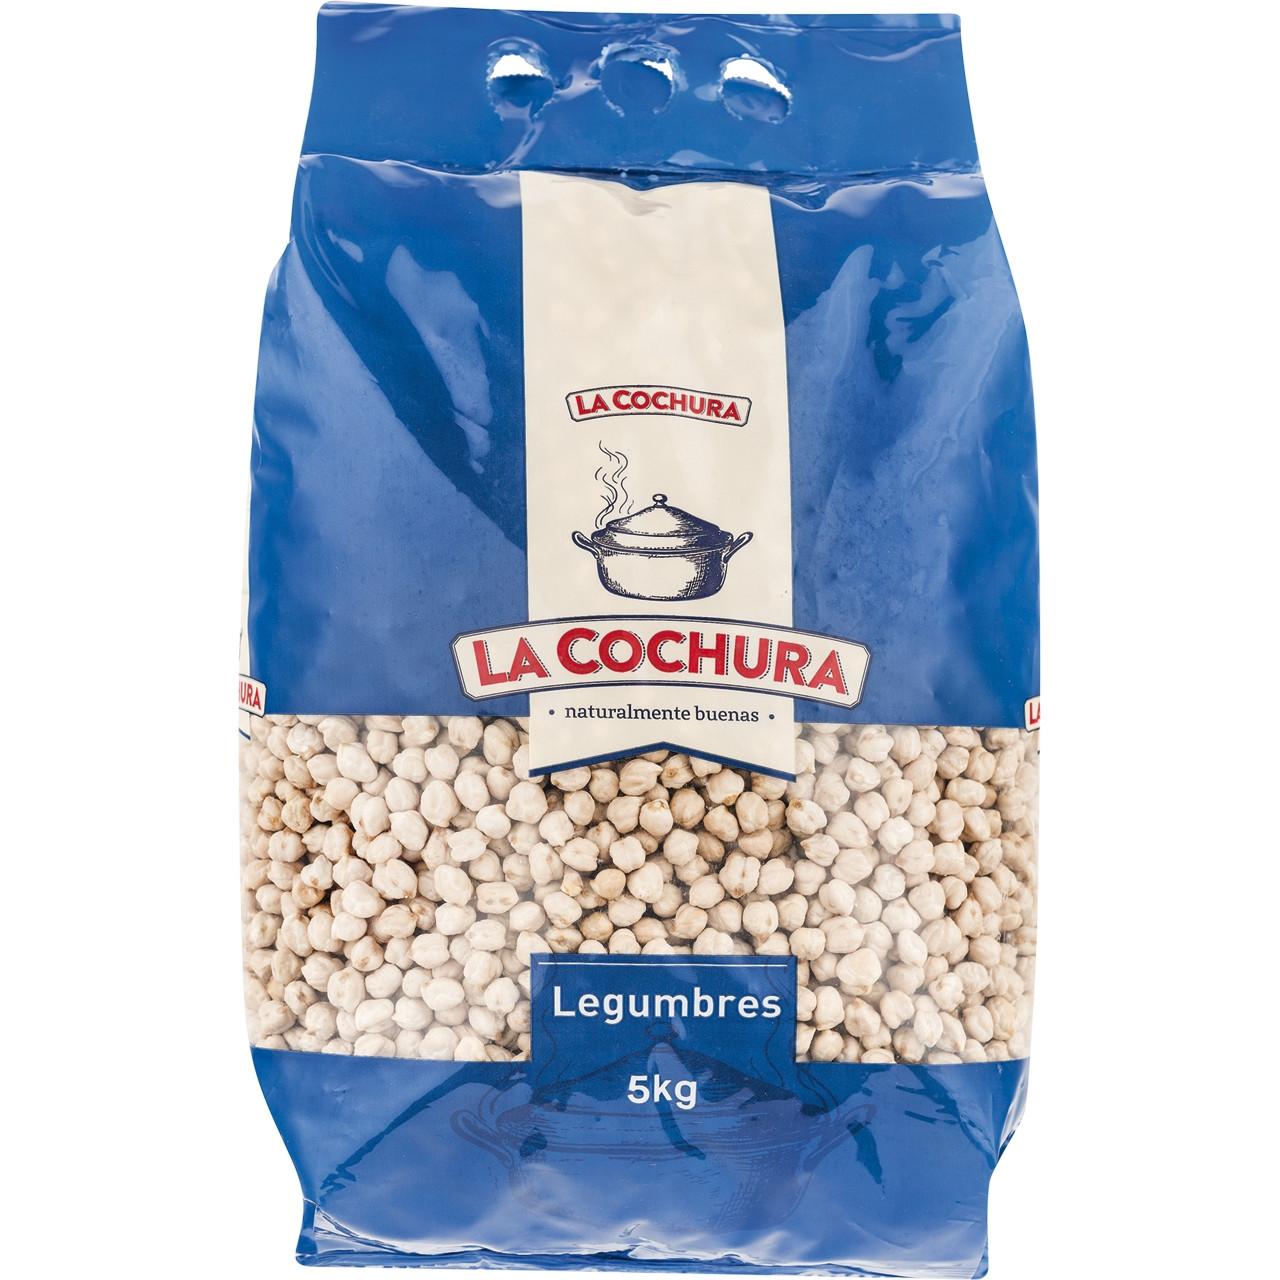 Cigró La Cochura